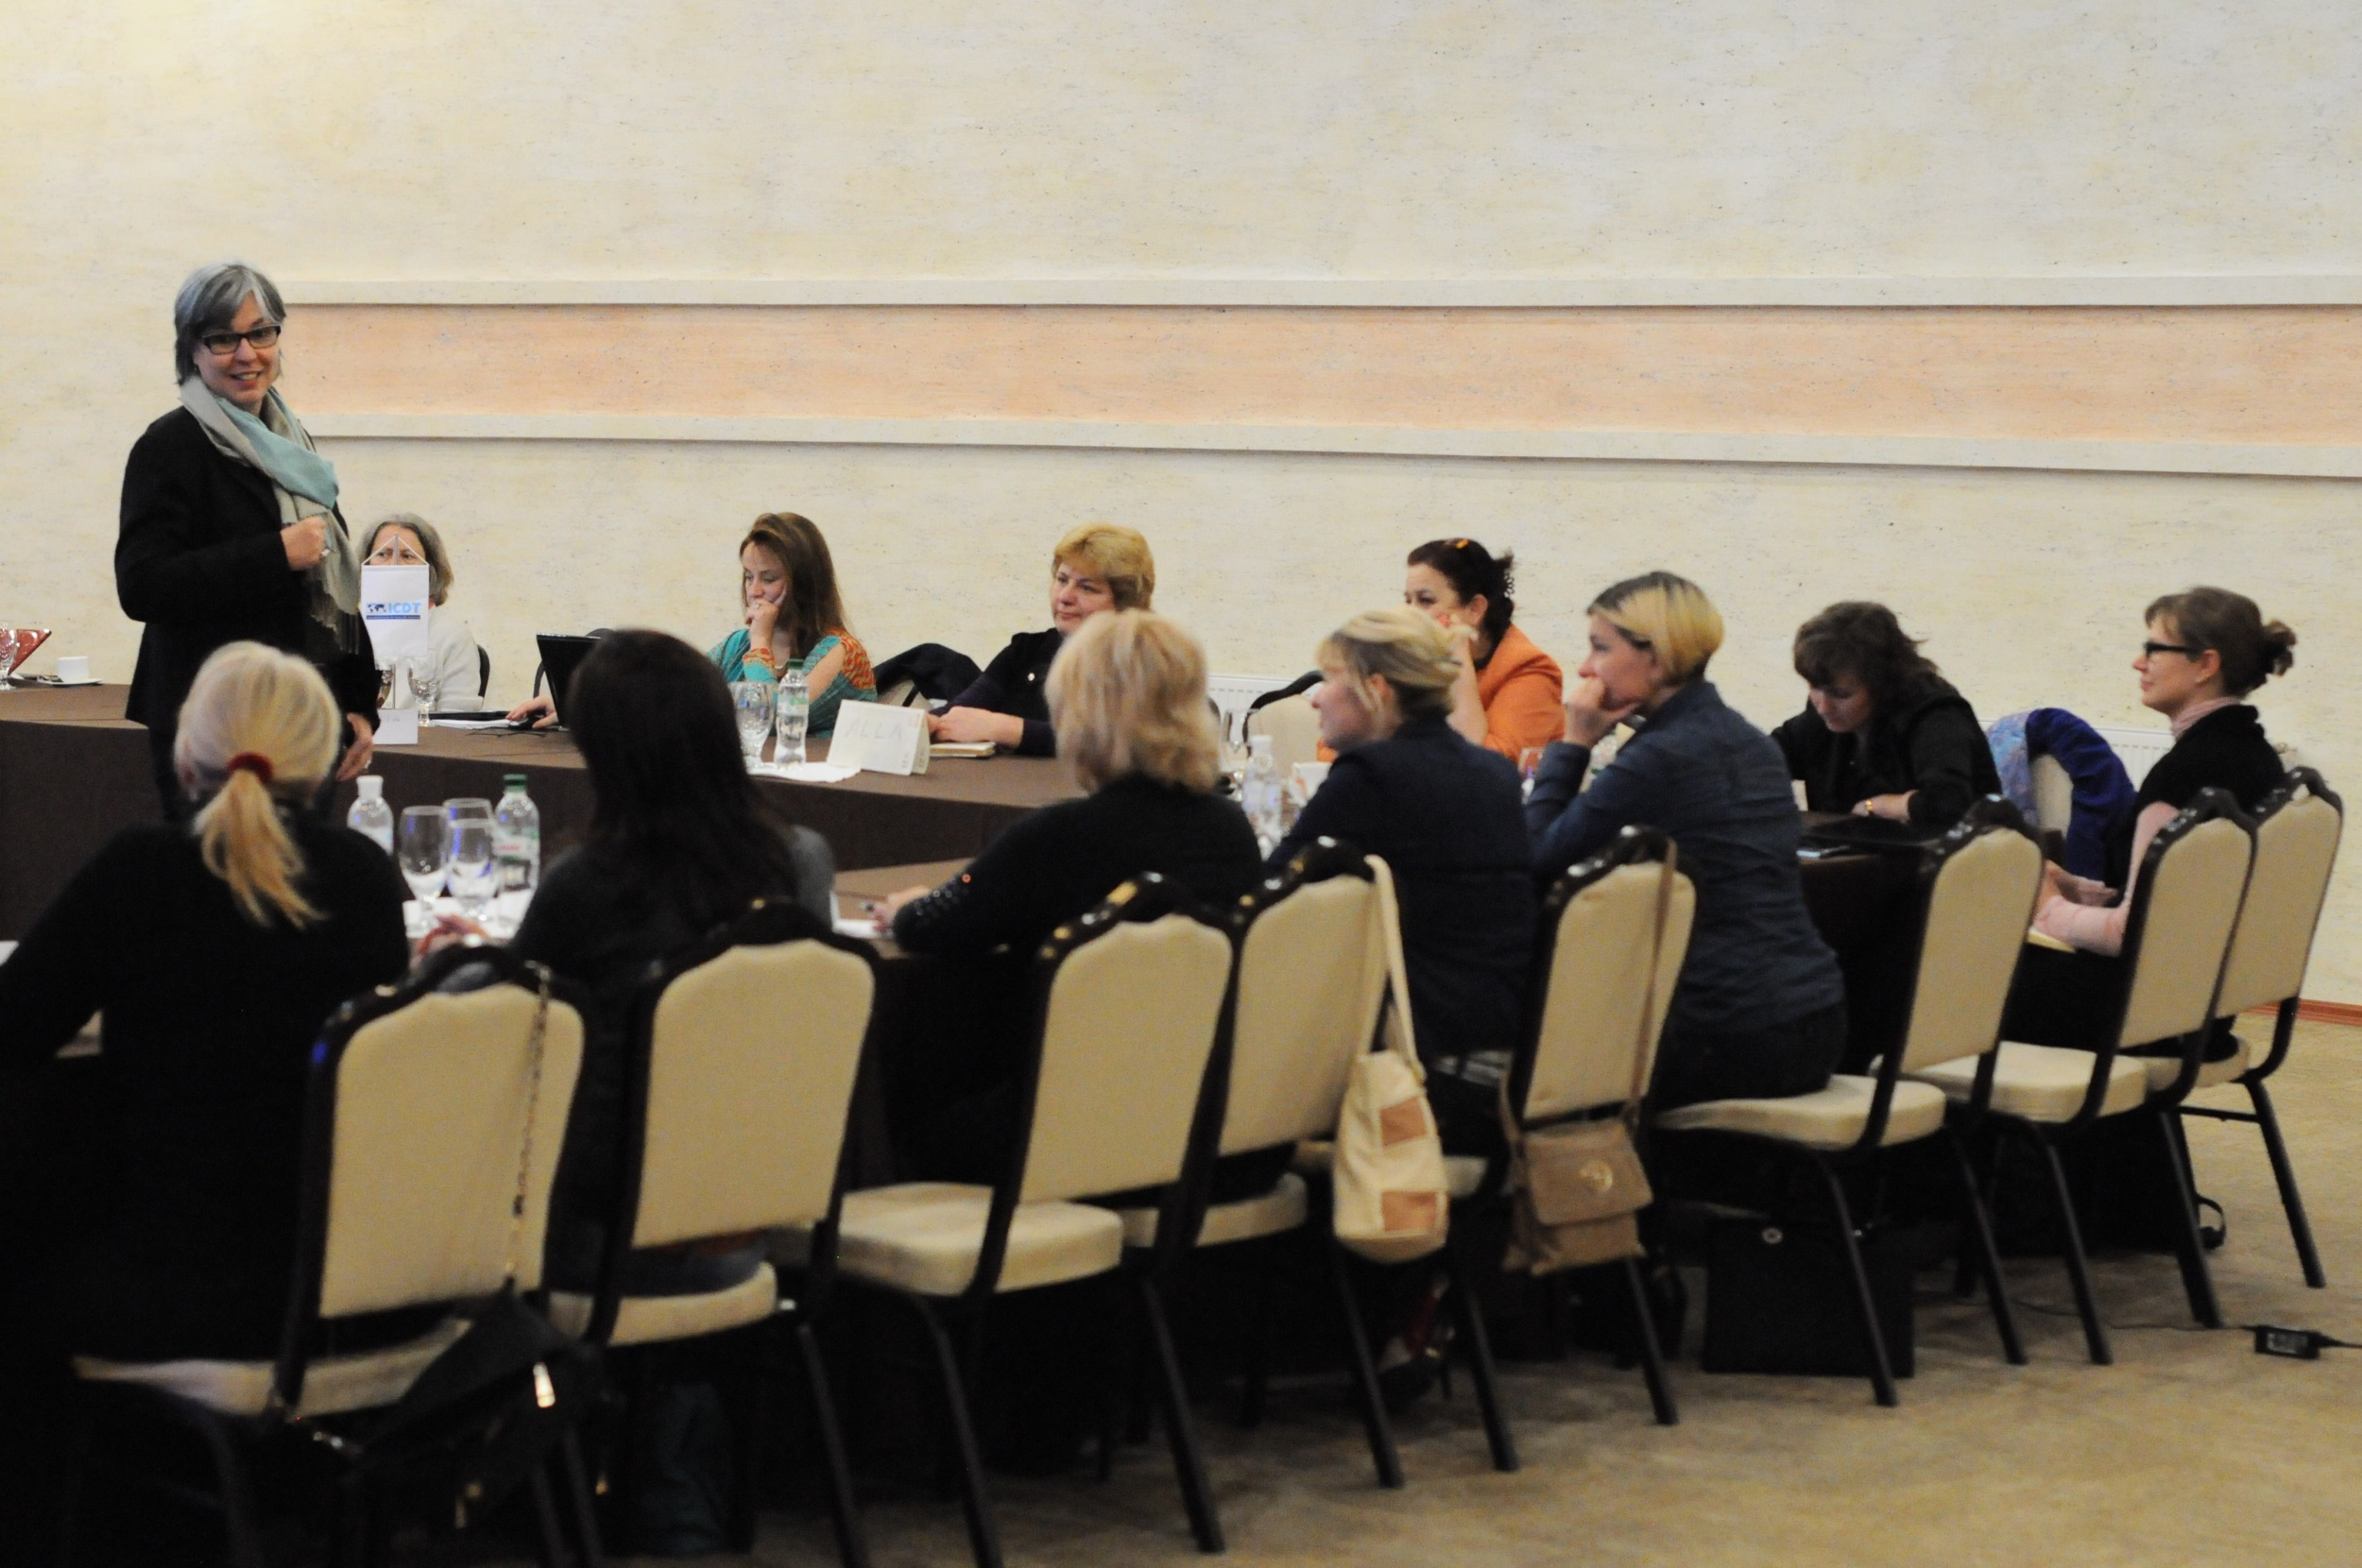 CIVEX Moldova - 2. seminář projektu v Tiraspolu, 27.9.2013